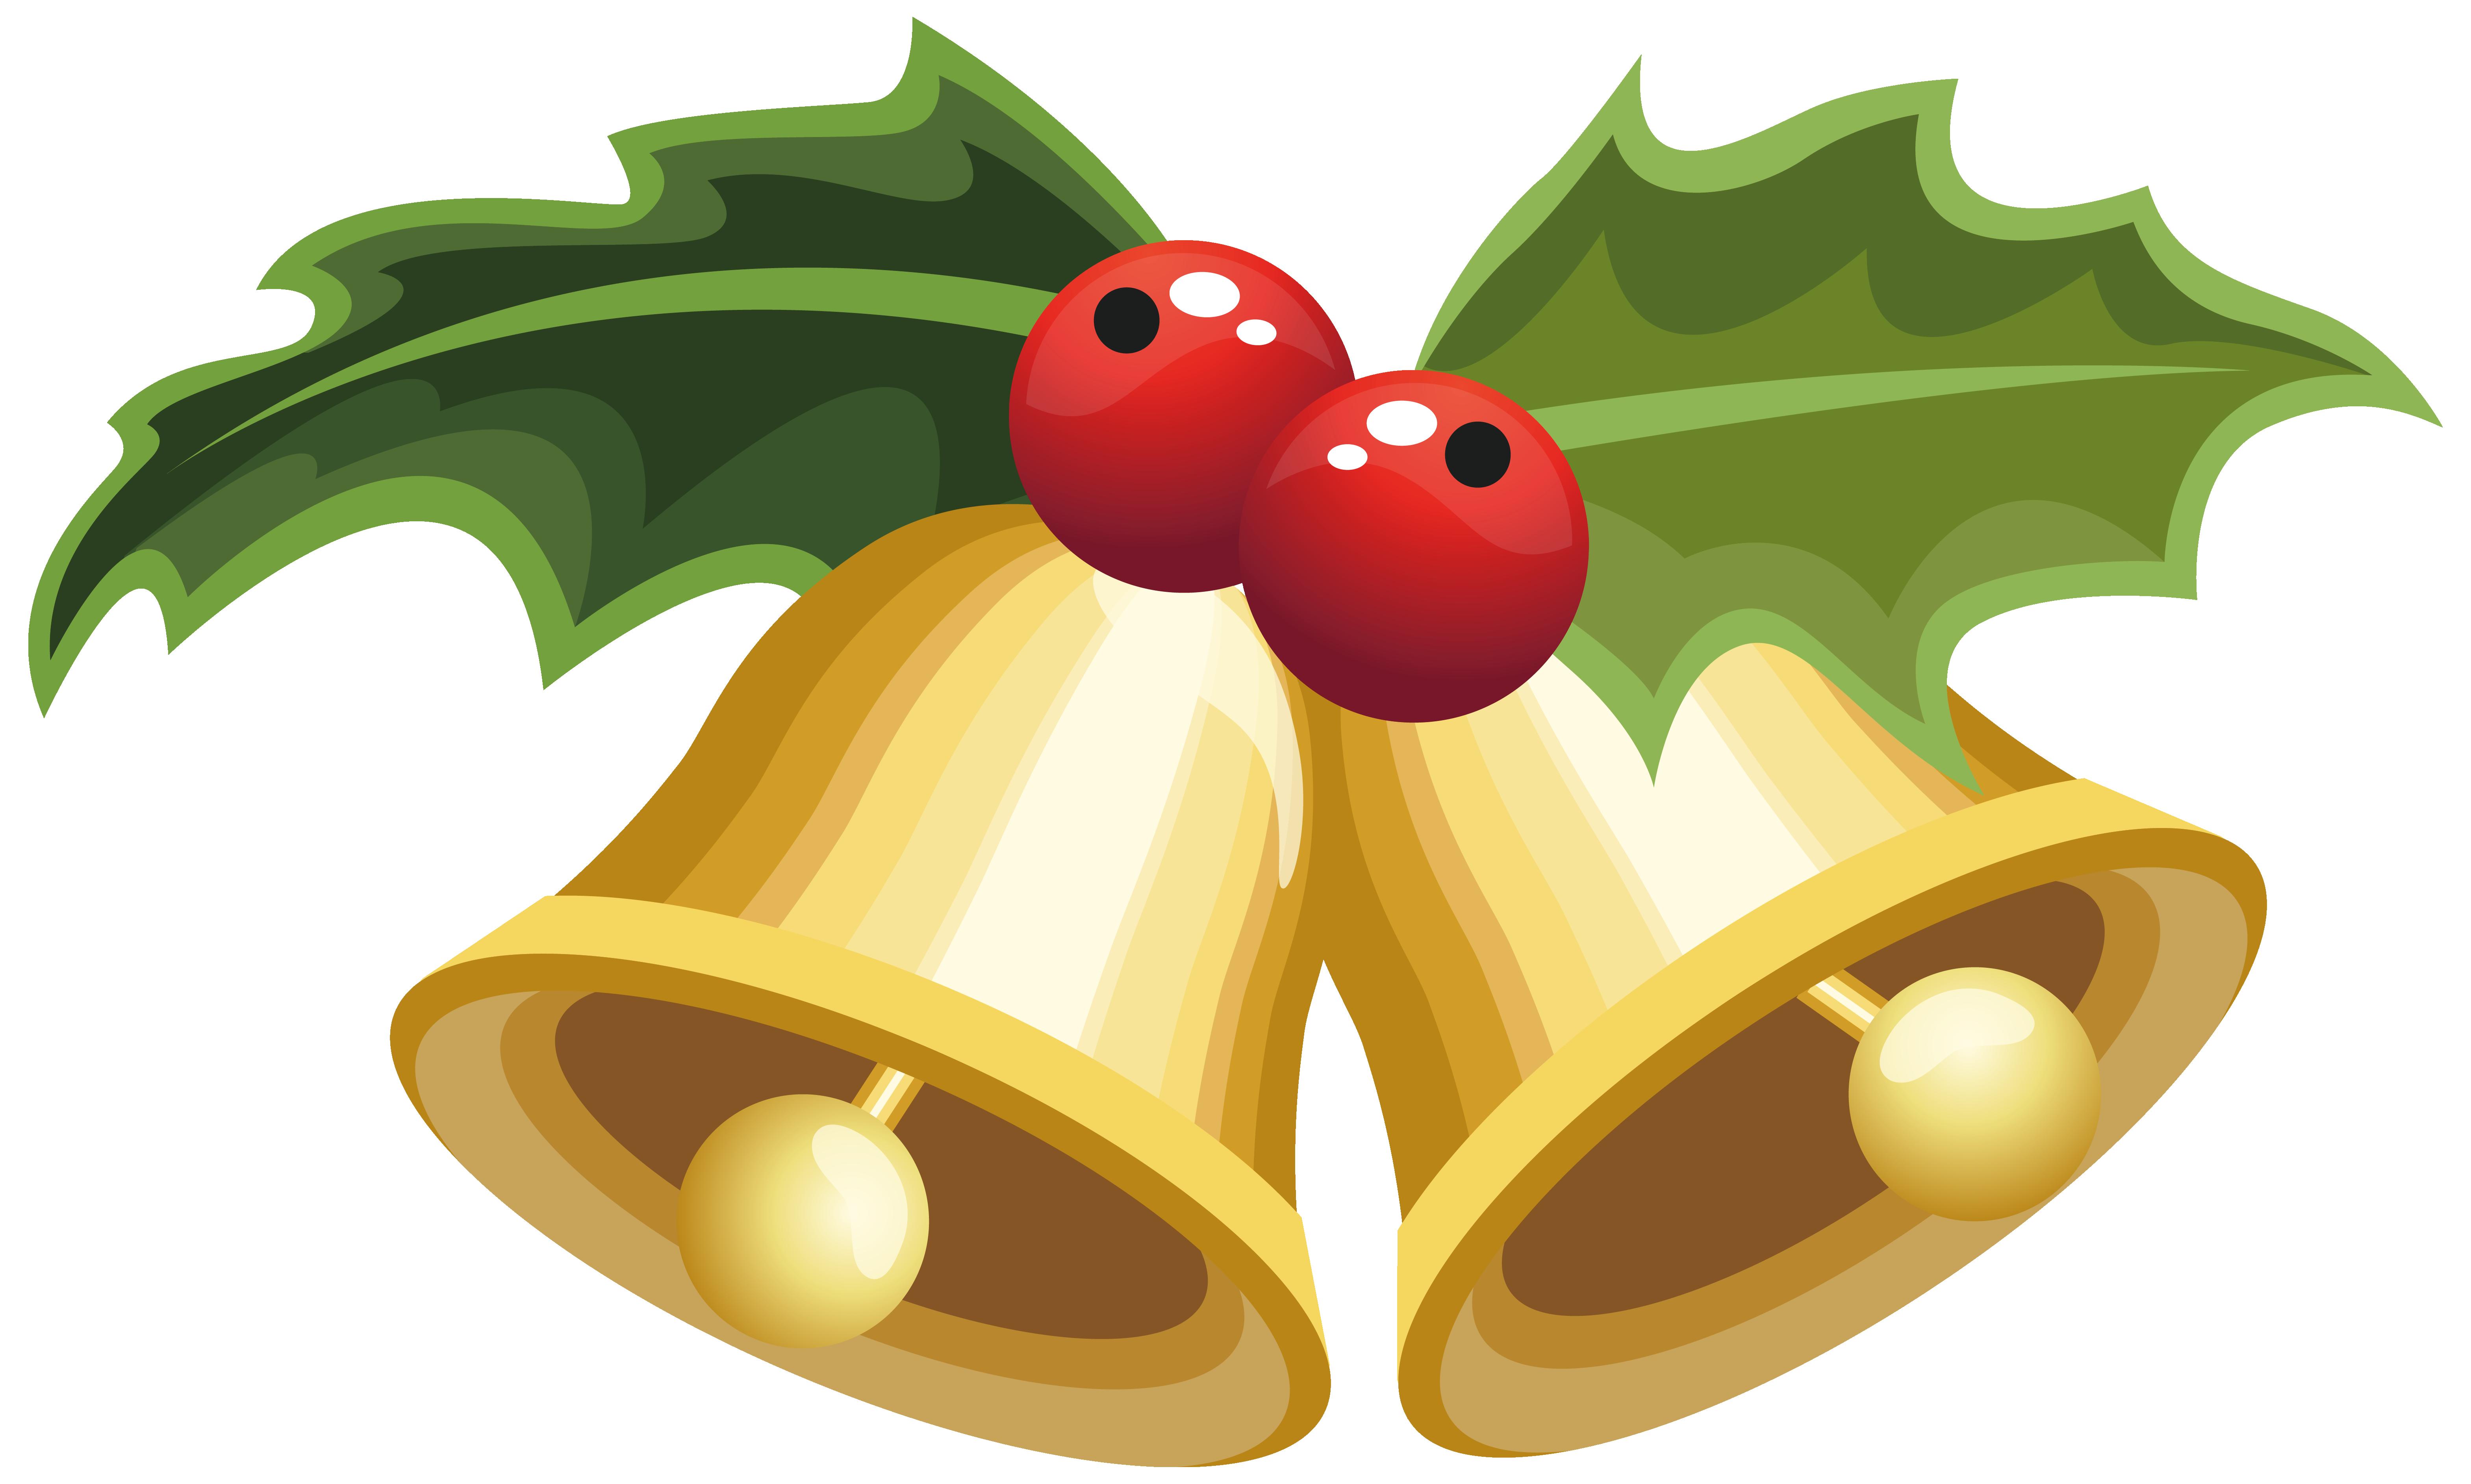 Mistletoe clipart clip art. Christmas viscum album common